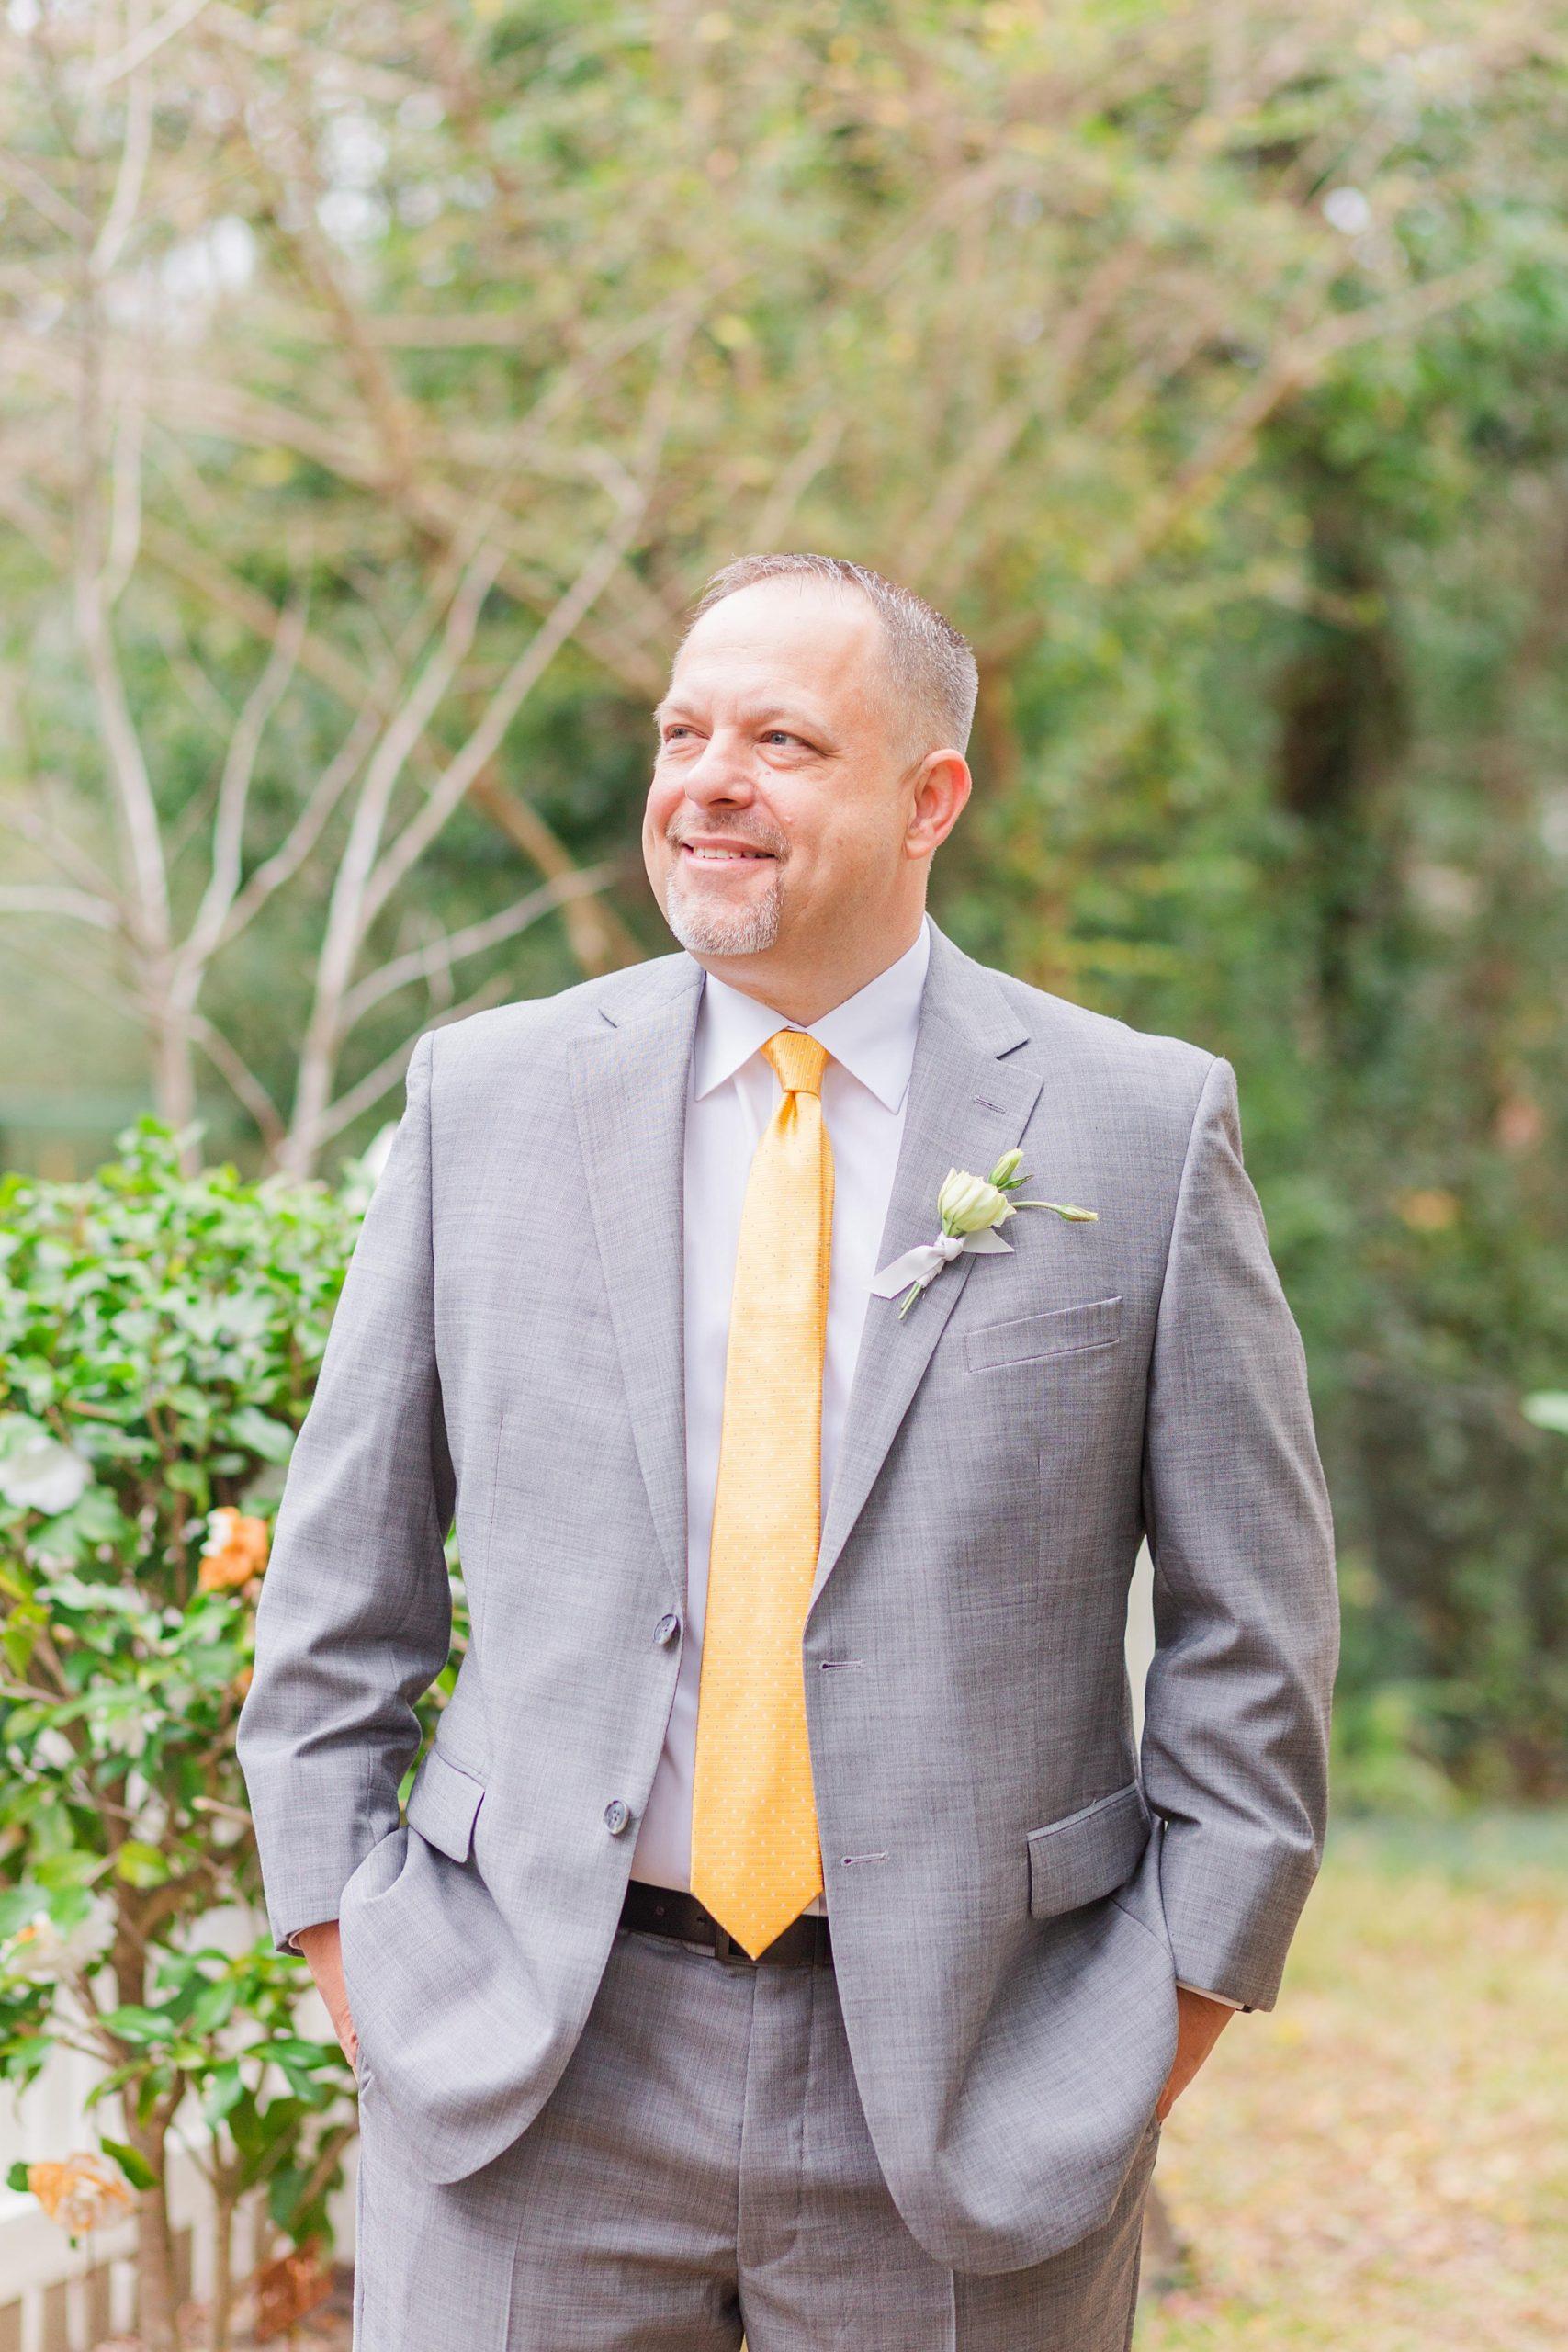 groom in grey suit with yellow tie